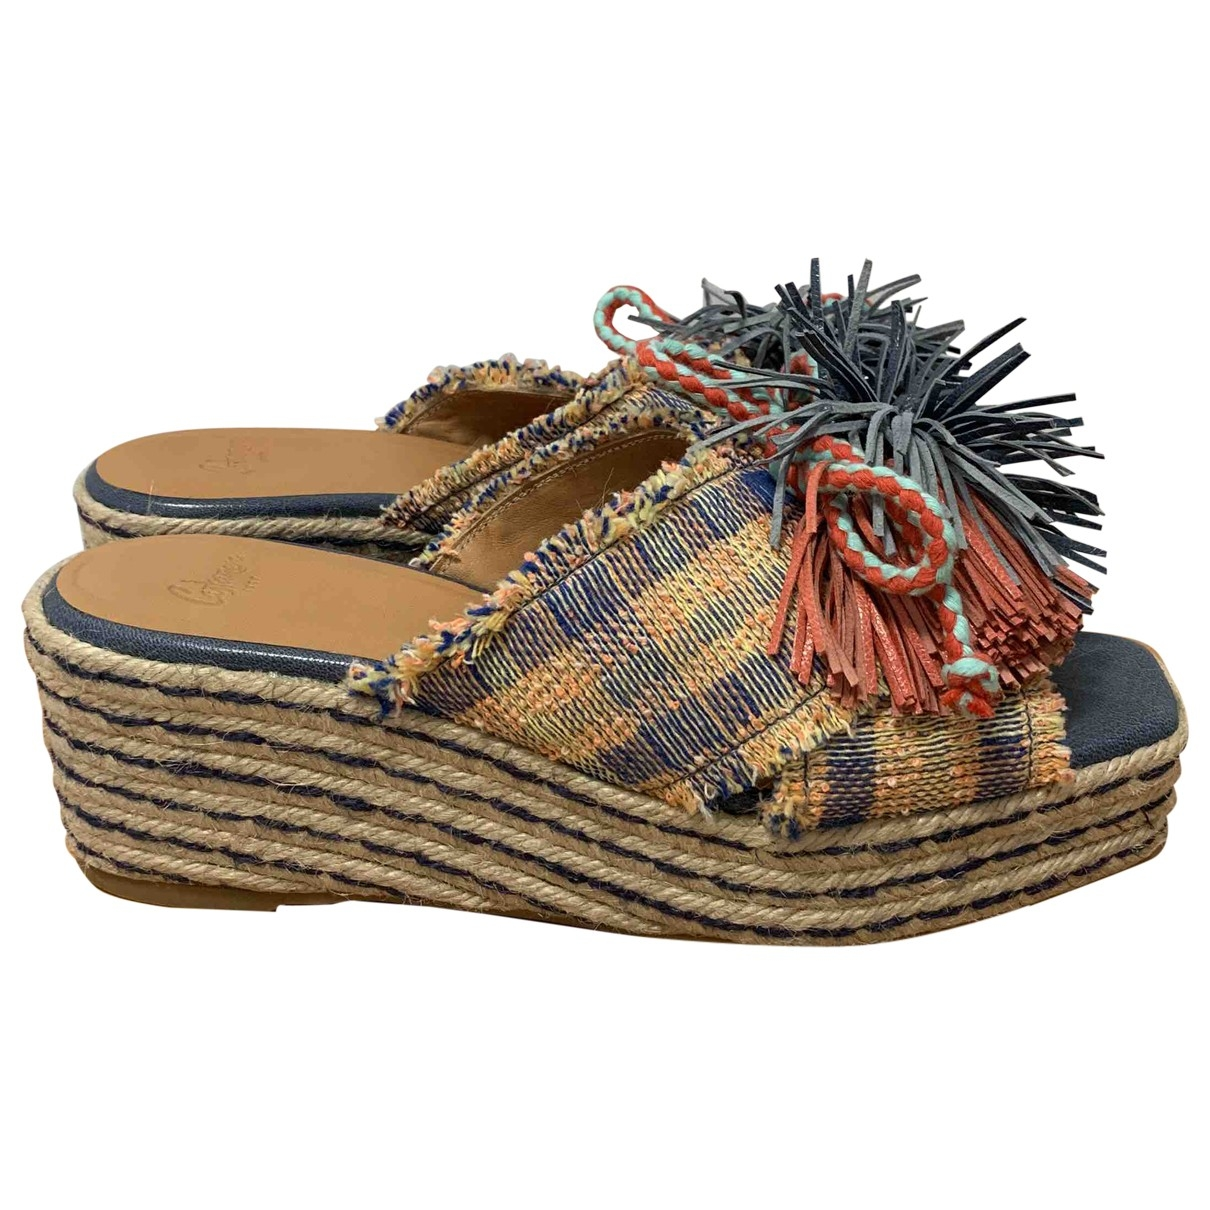 Castaner \N Multicolour Tweed Mules & Clogs for Women 39.5 EU